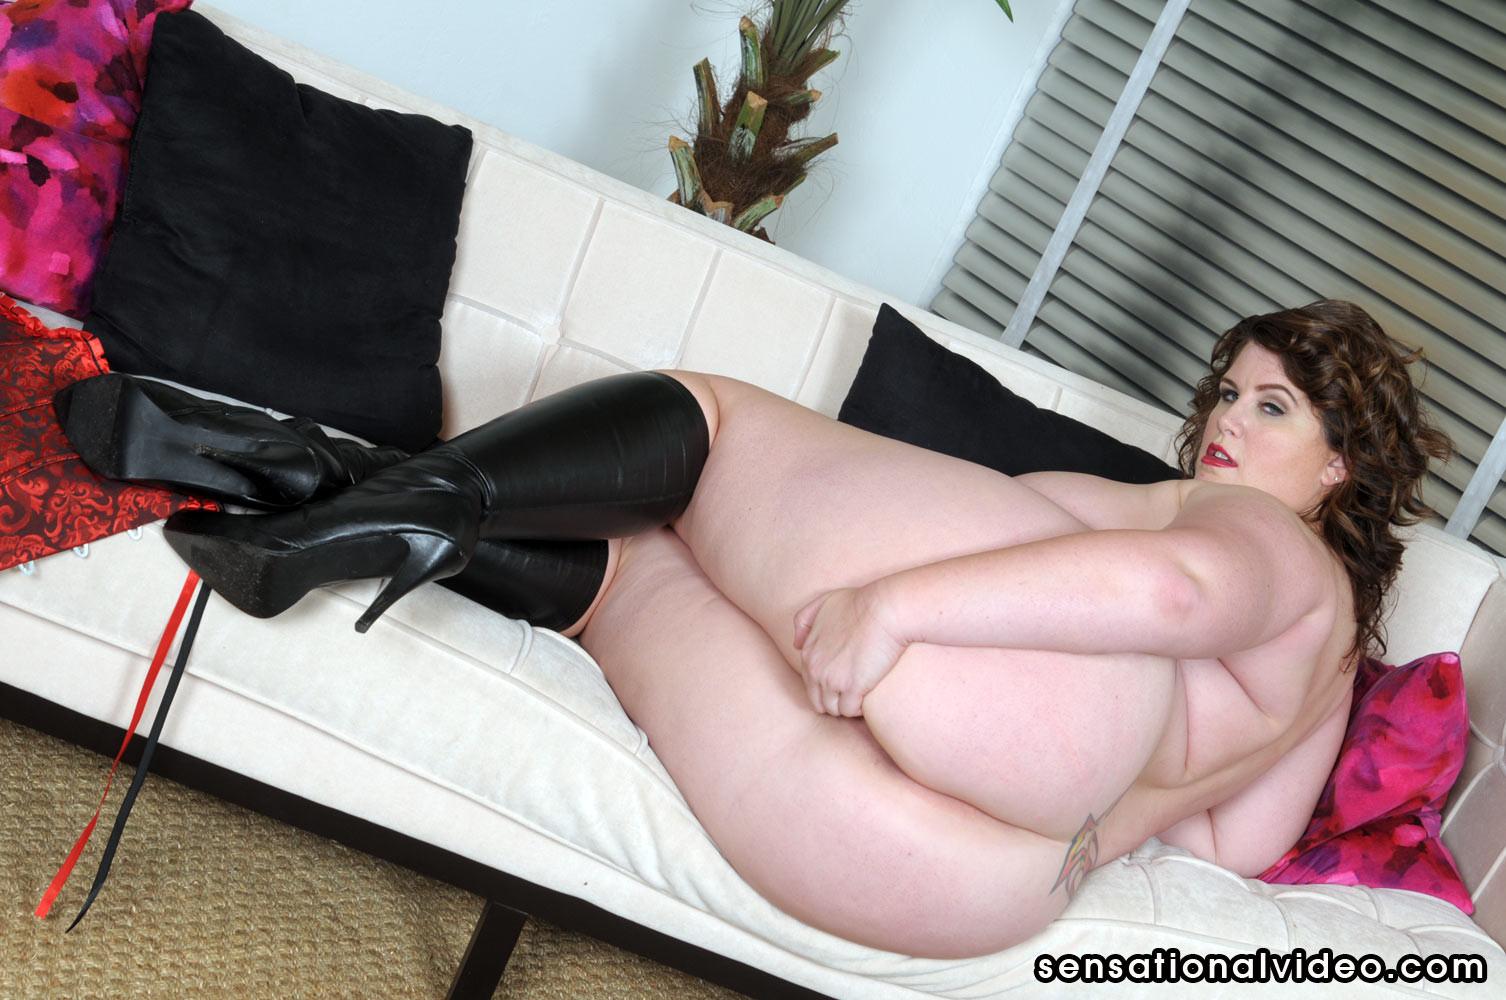 Desi nude pregnant women